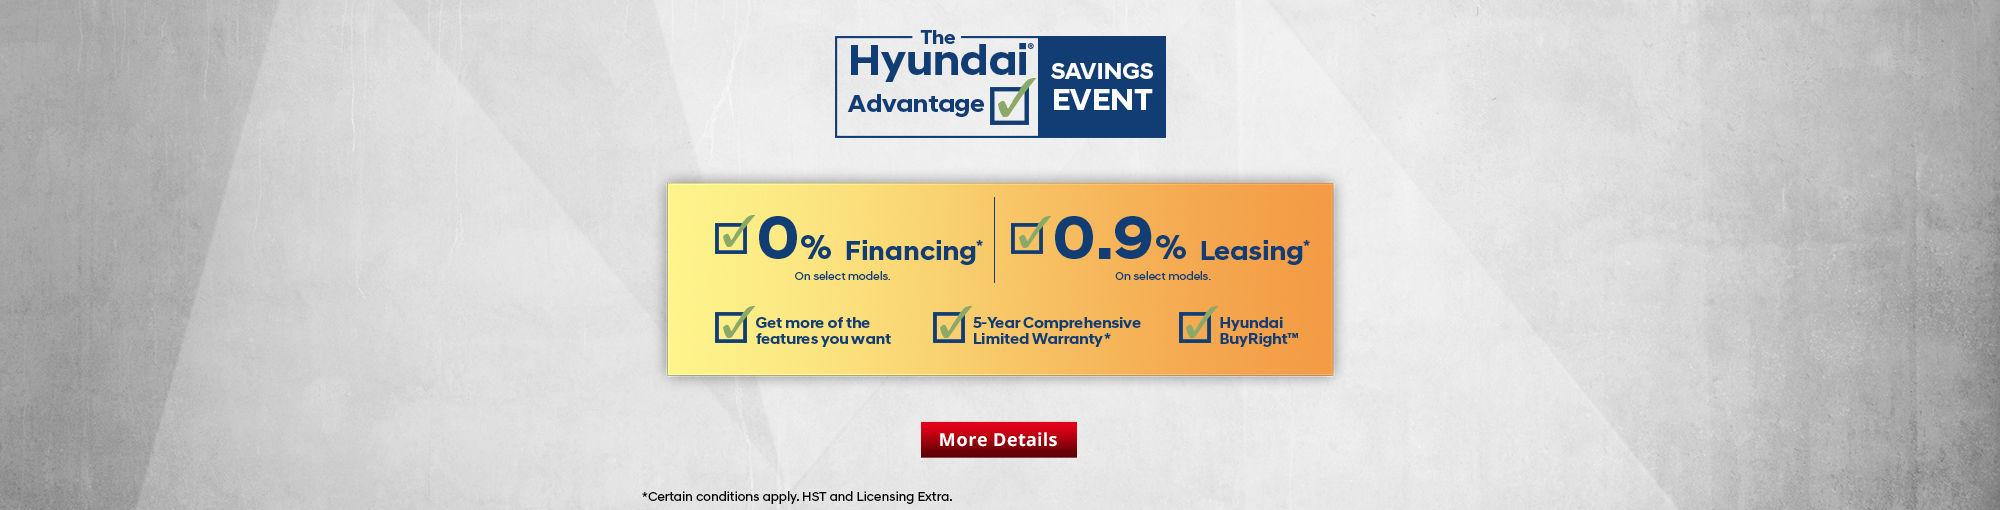 The Hyundai Advantage Savings Event